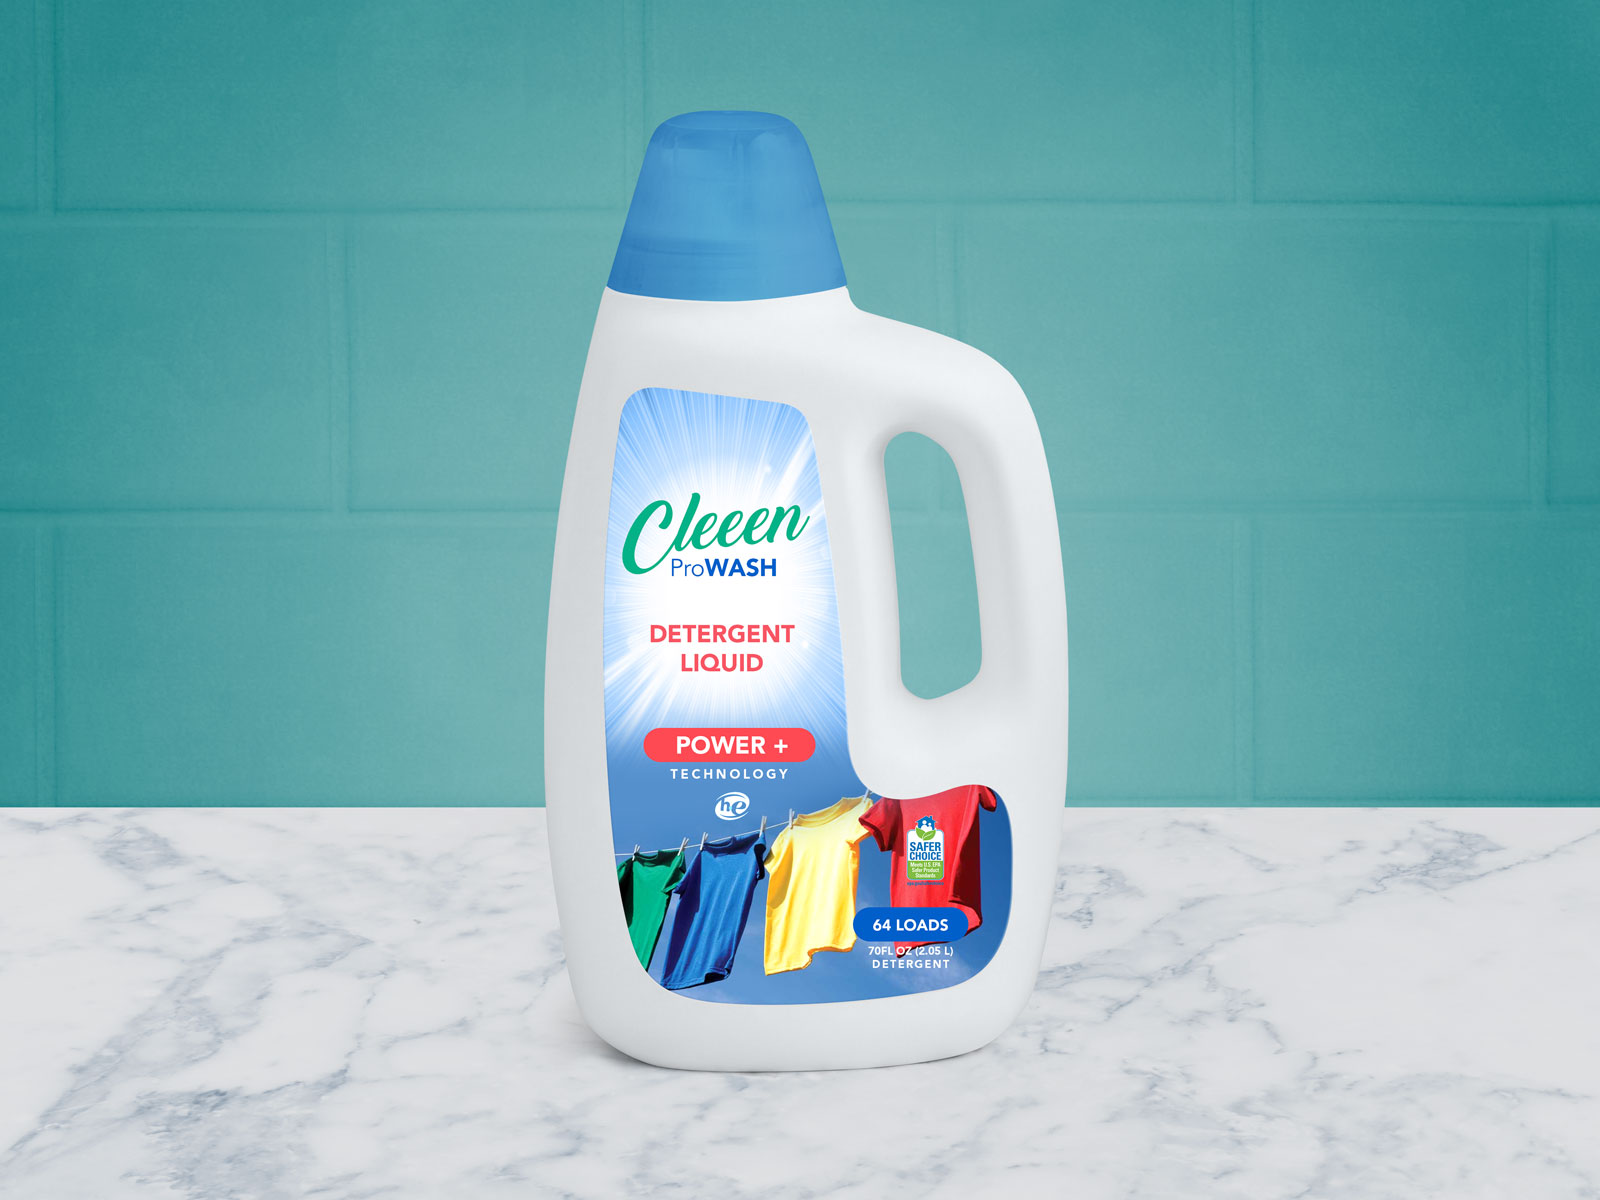 Free-Liquid-Detergent-Bottle-Mockup-PSD